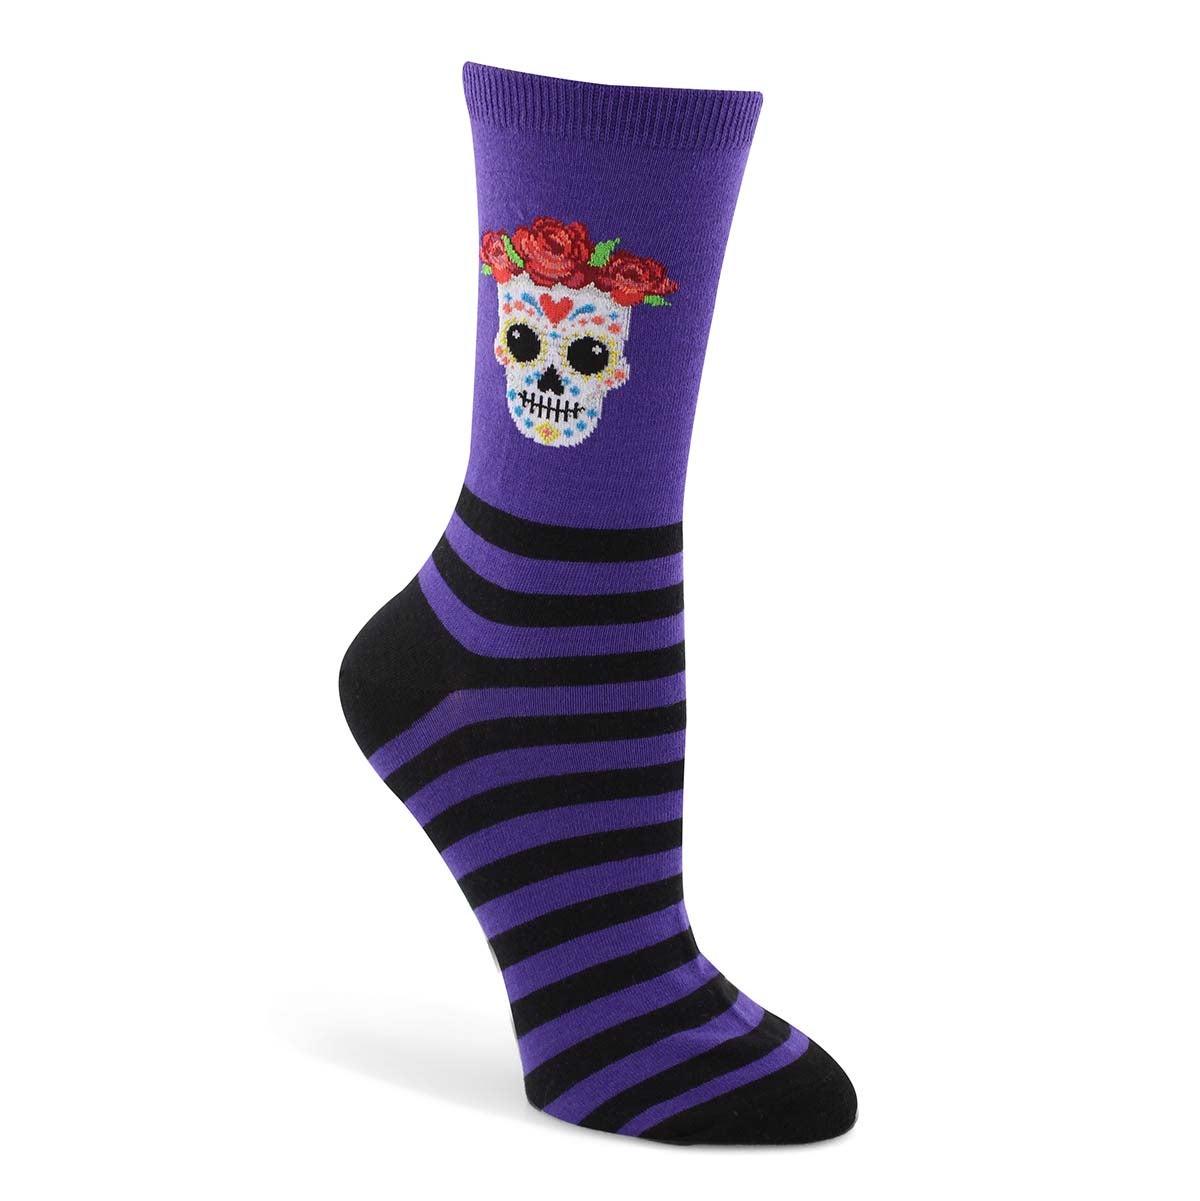 Lds Sugar Skull purple printed sock